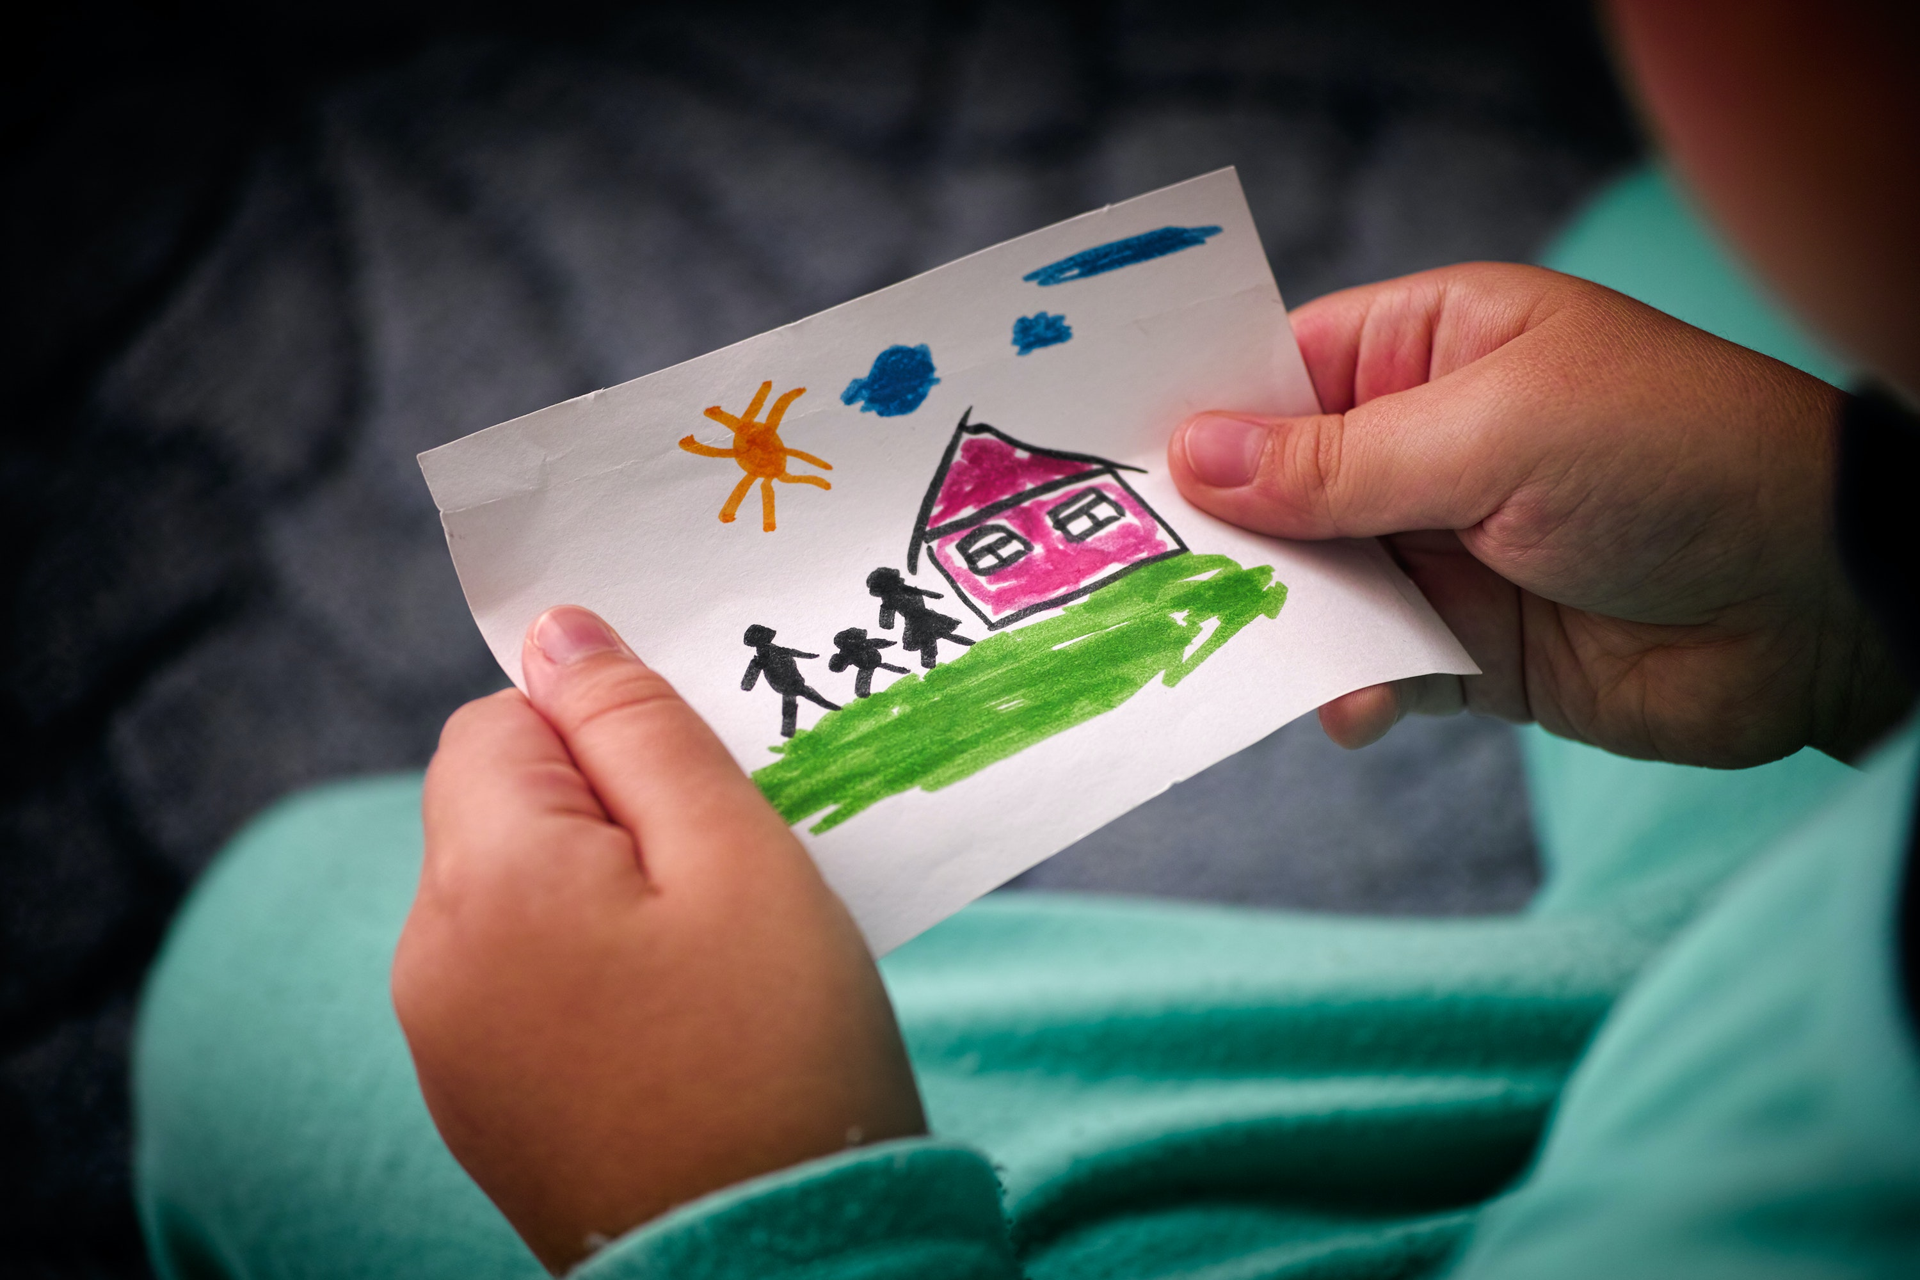 The US adoption system discriminates against darker-skinned children